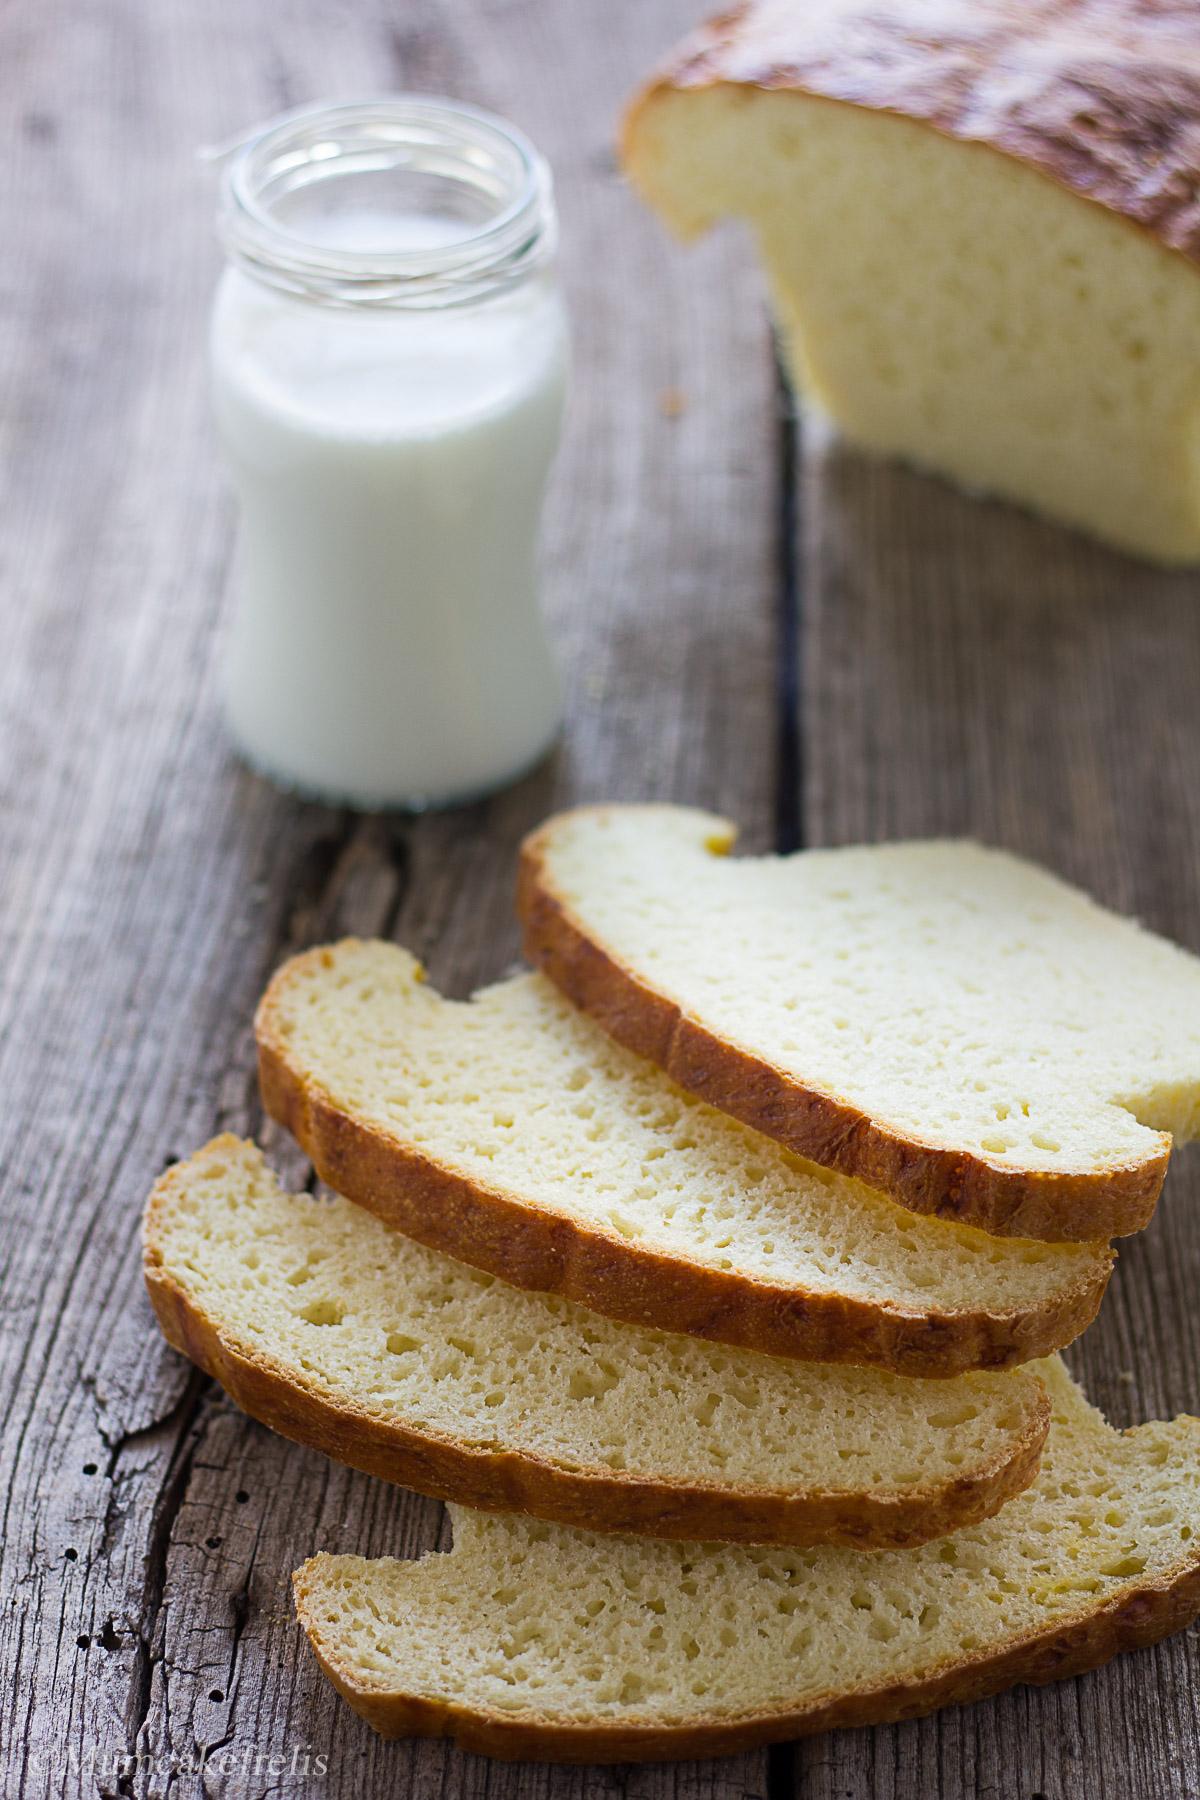 Hokkaido Milk Loaf